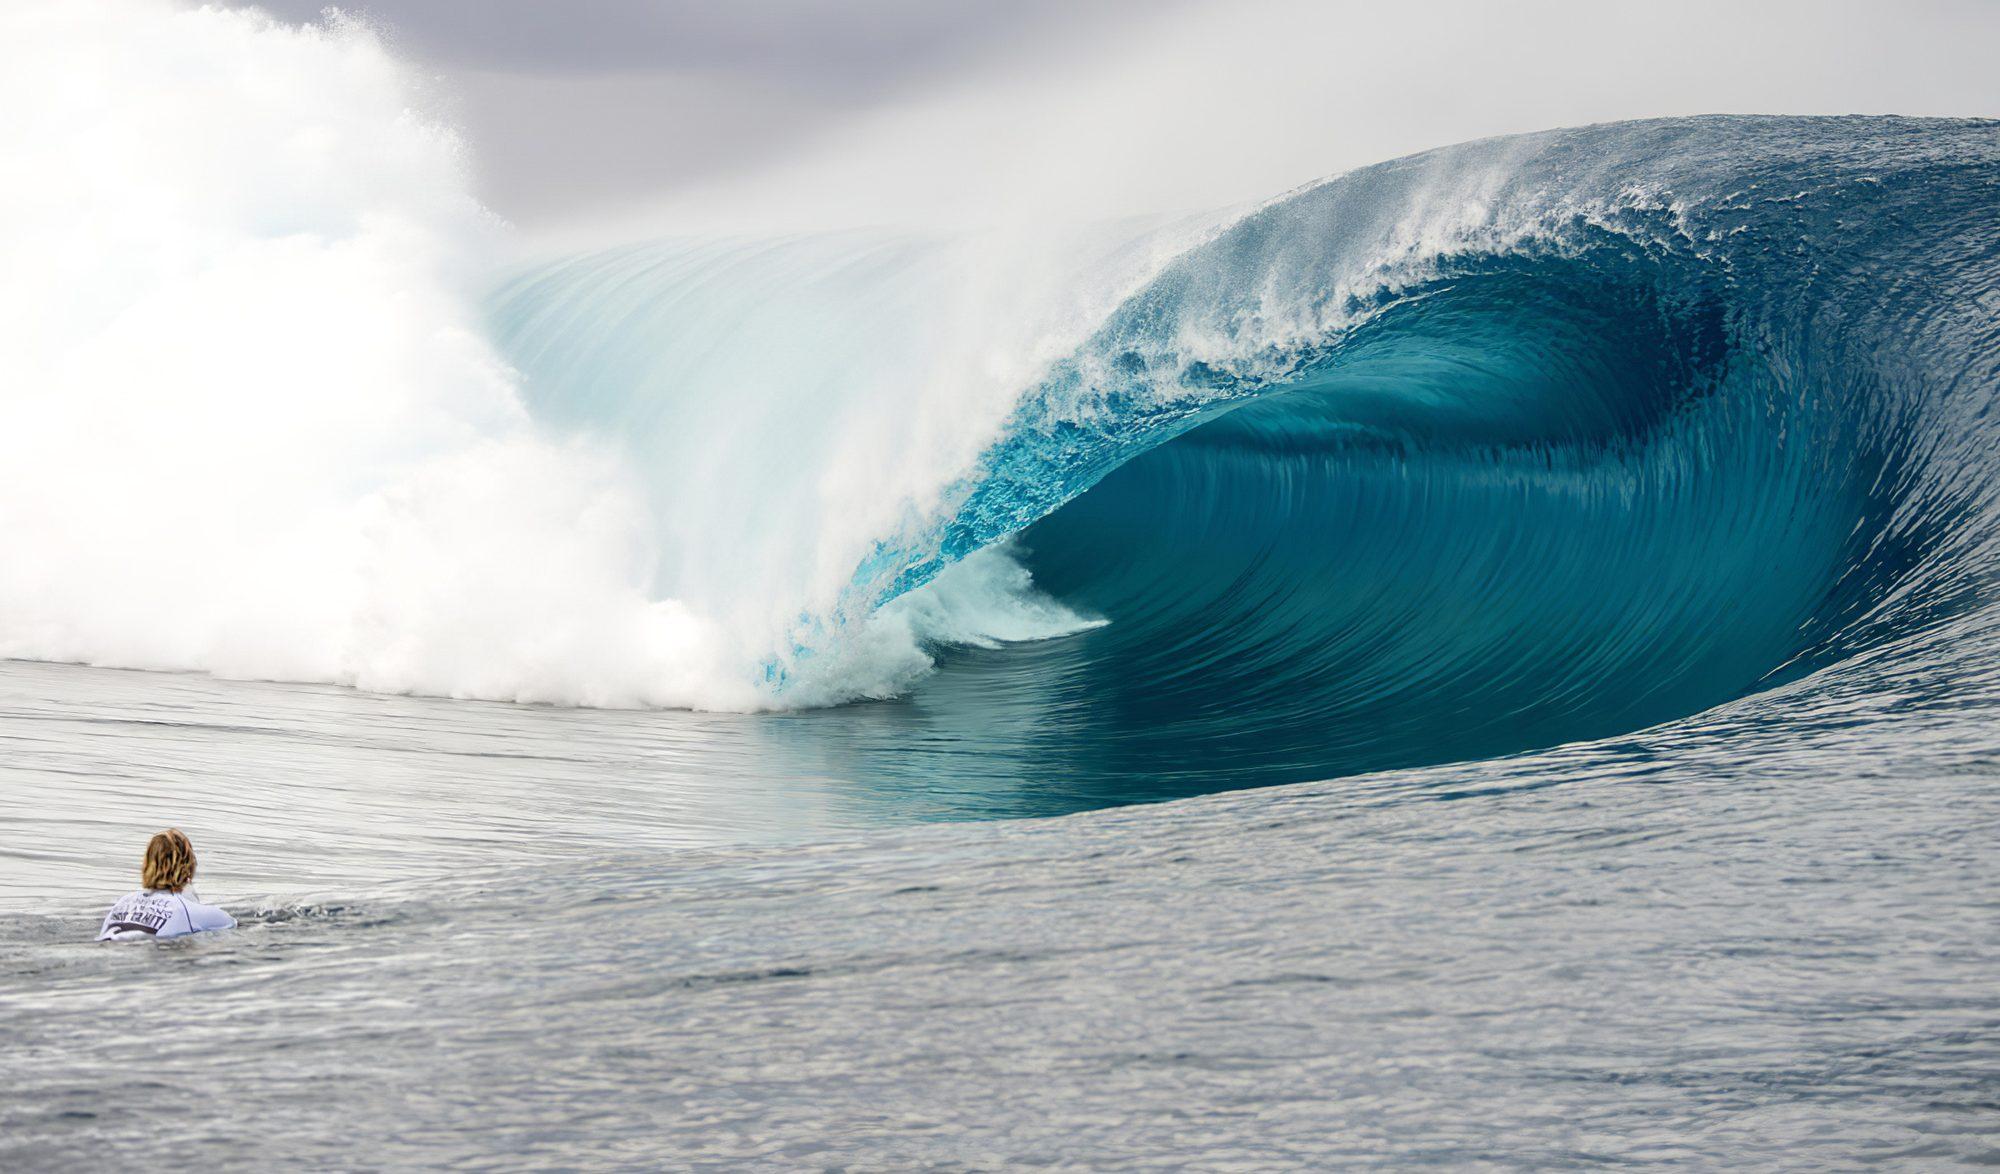 Teahupoo, vague mythique de Tahiti